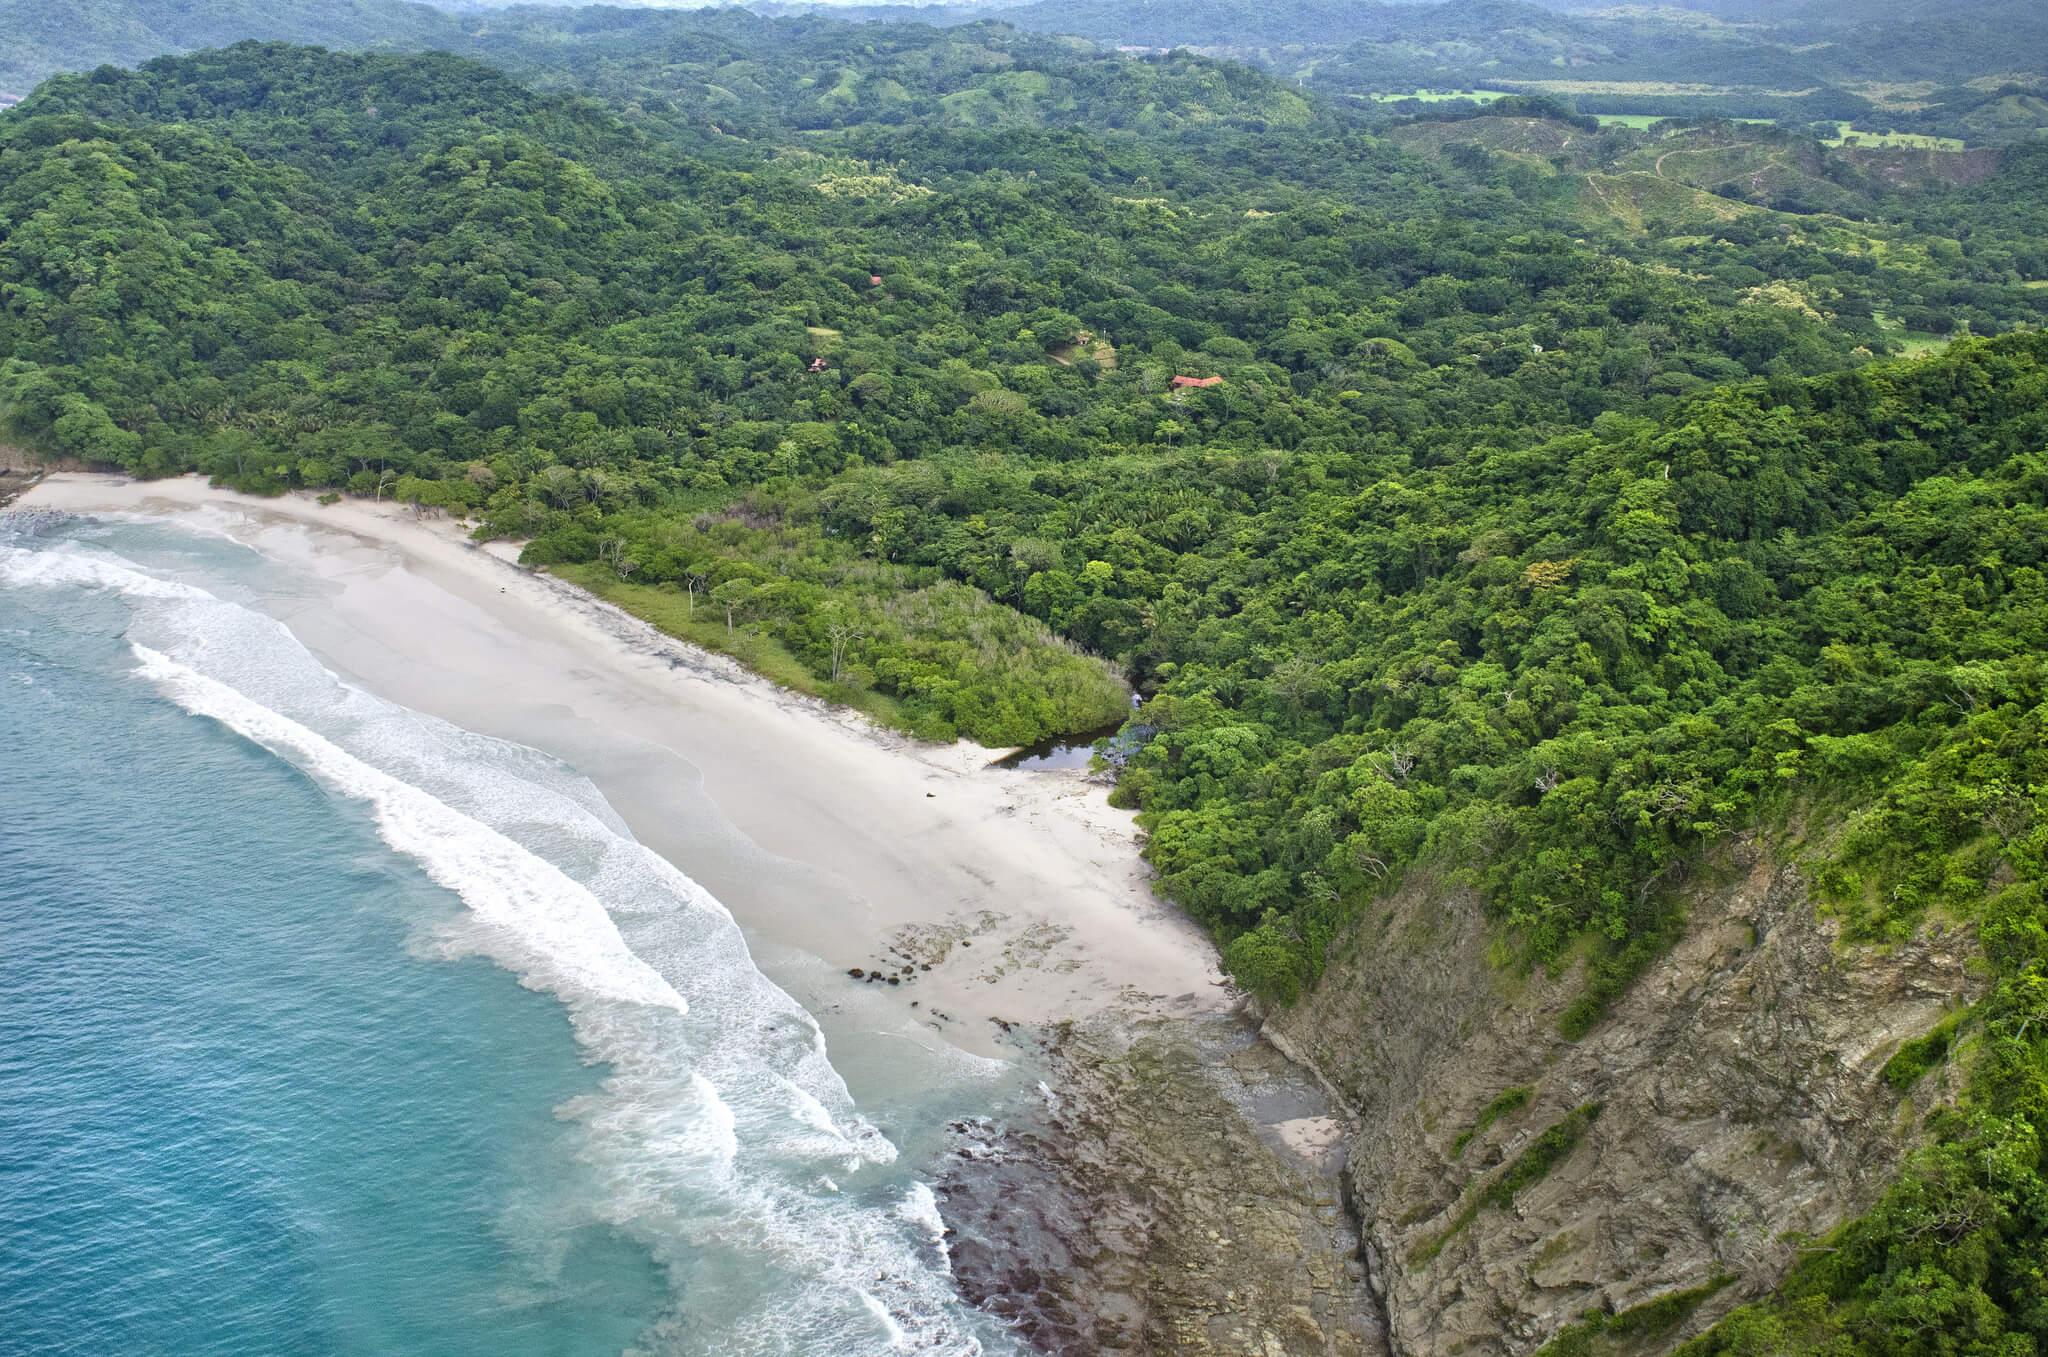 Barrgiona Surfing Costa Rica